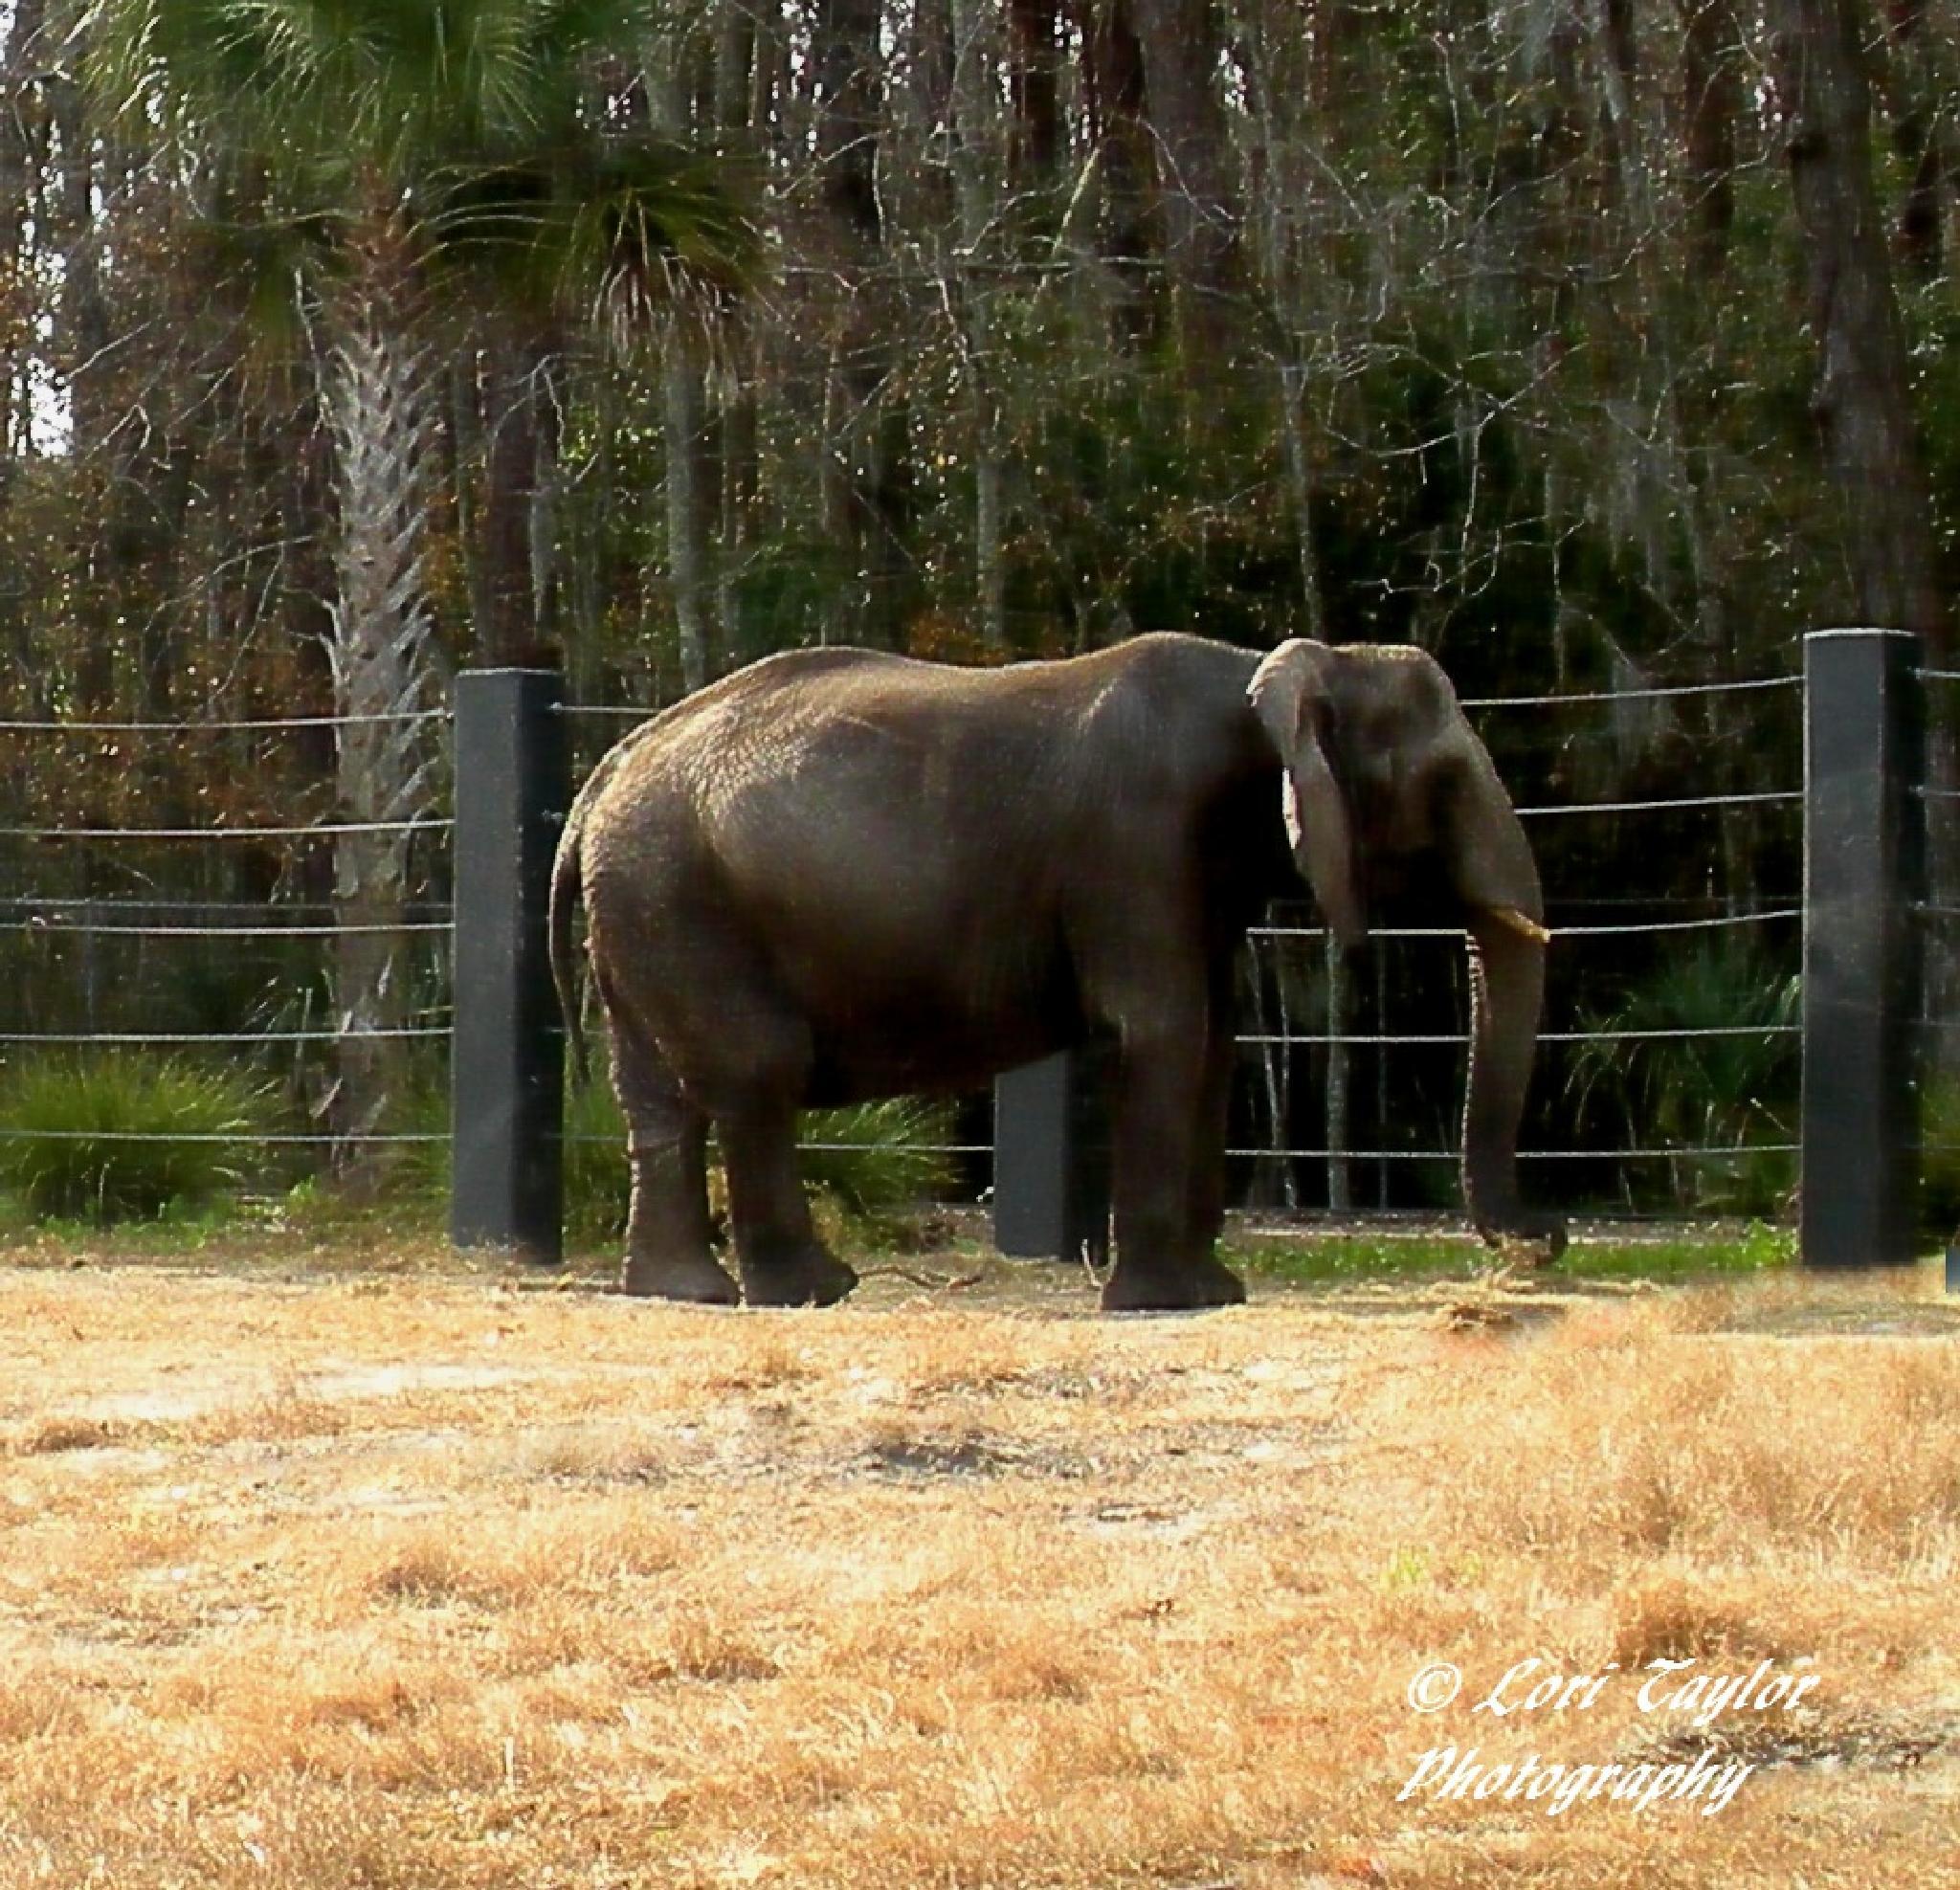 Elephant by Lori21929